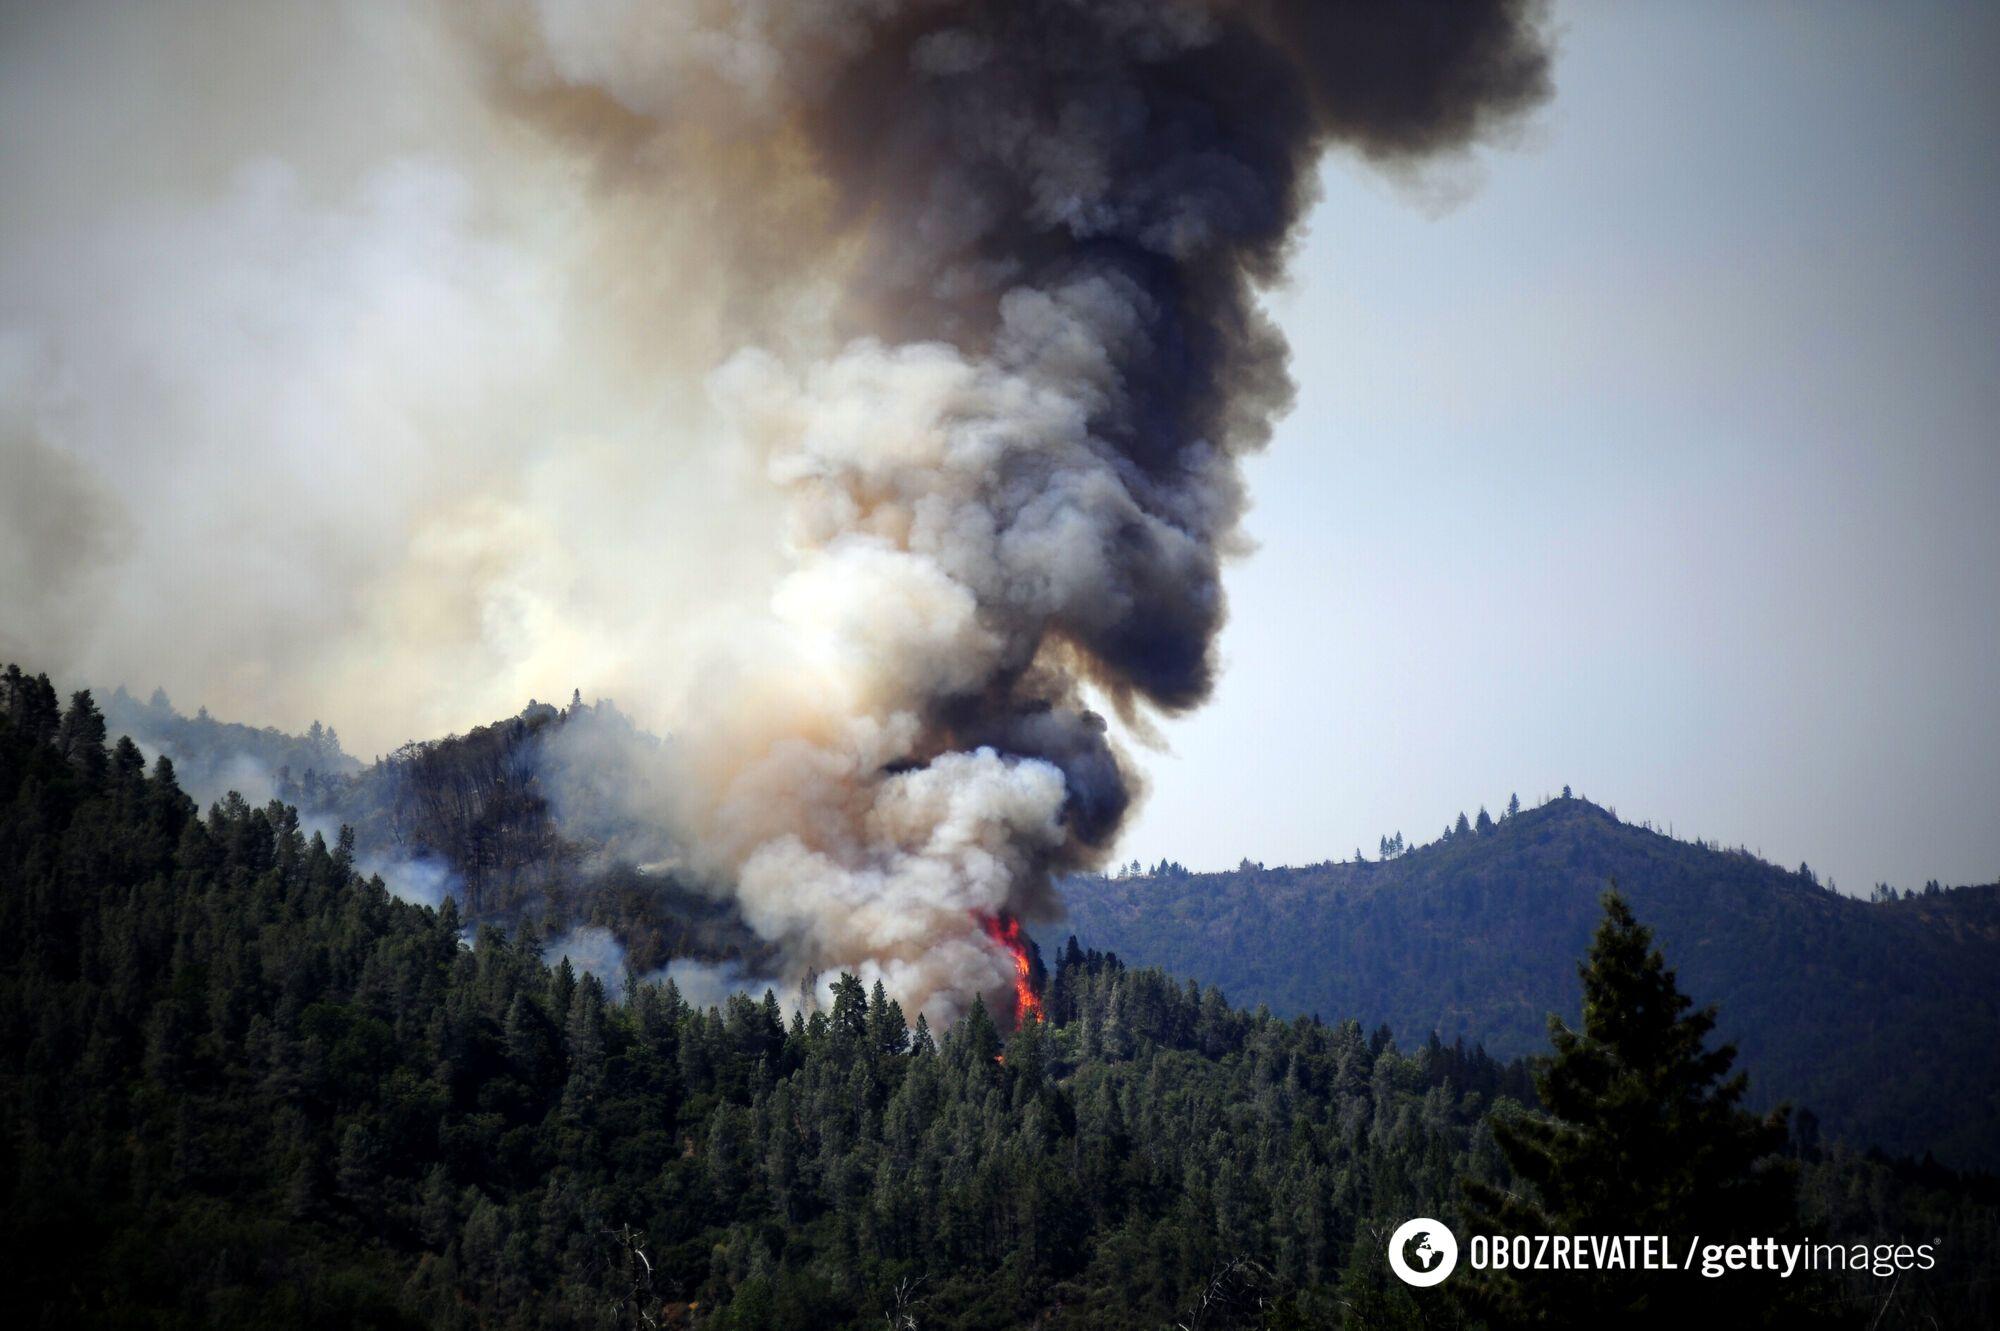 Дым от огня поднялся до небес